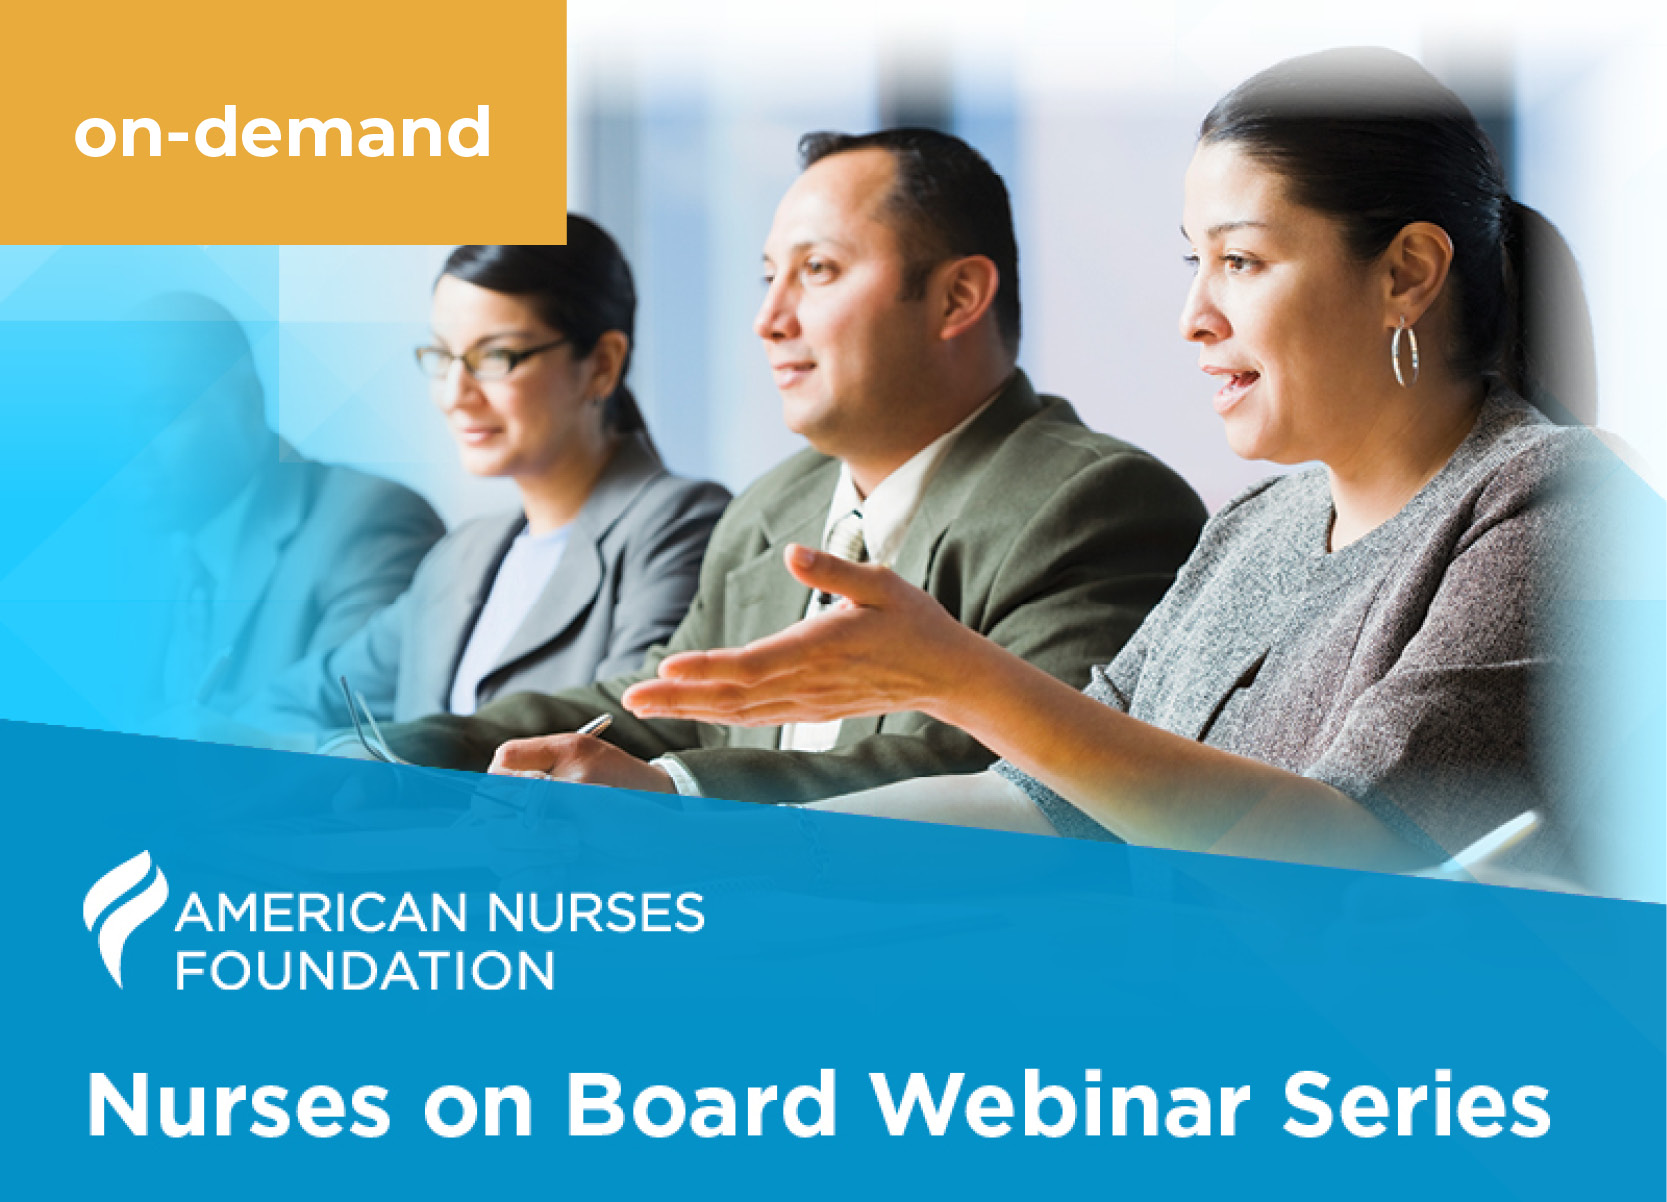 American Nurses Foundation. Nurses on Board Webinar Series